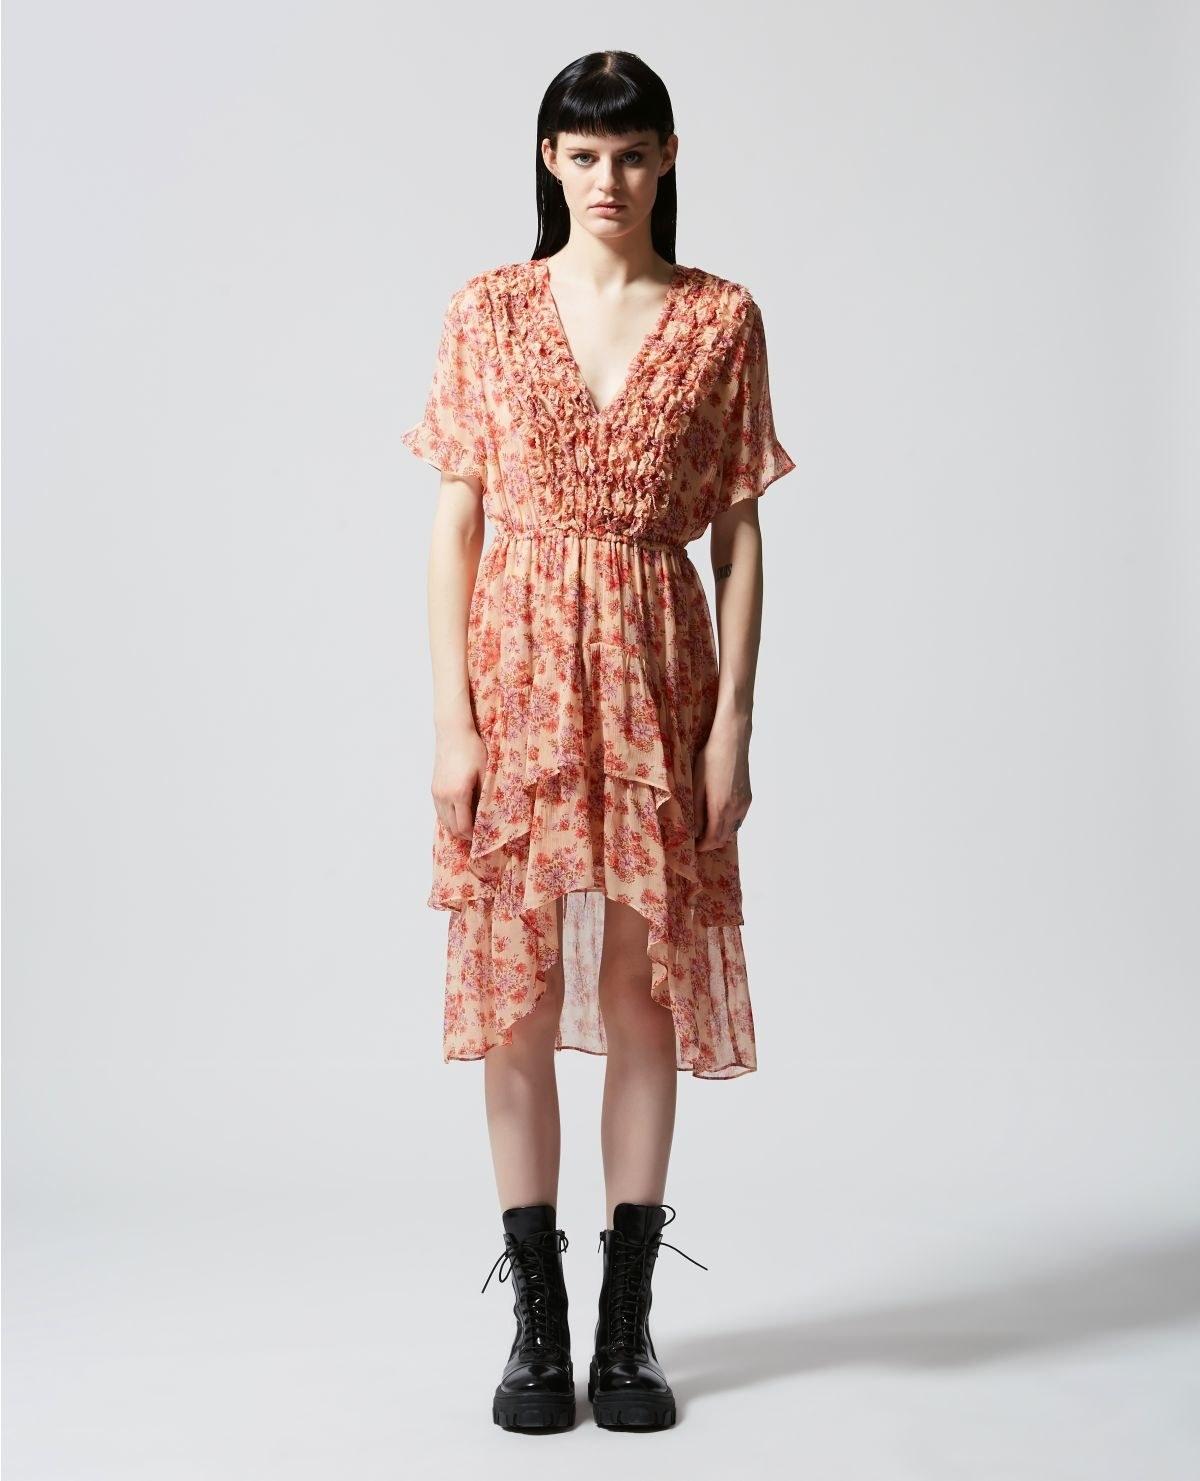 model wearing midi pink printed V-neck dress